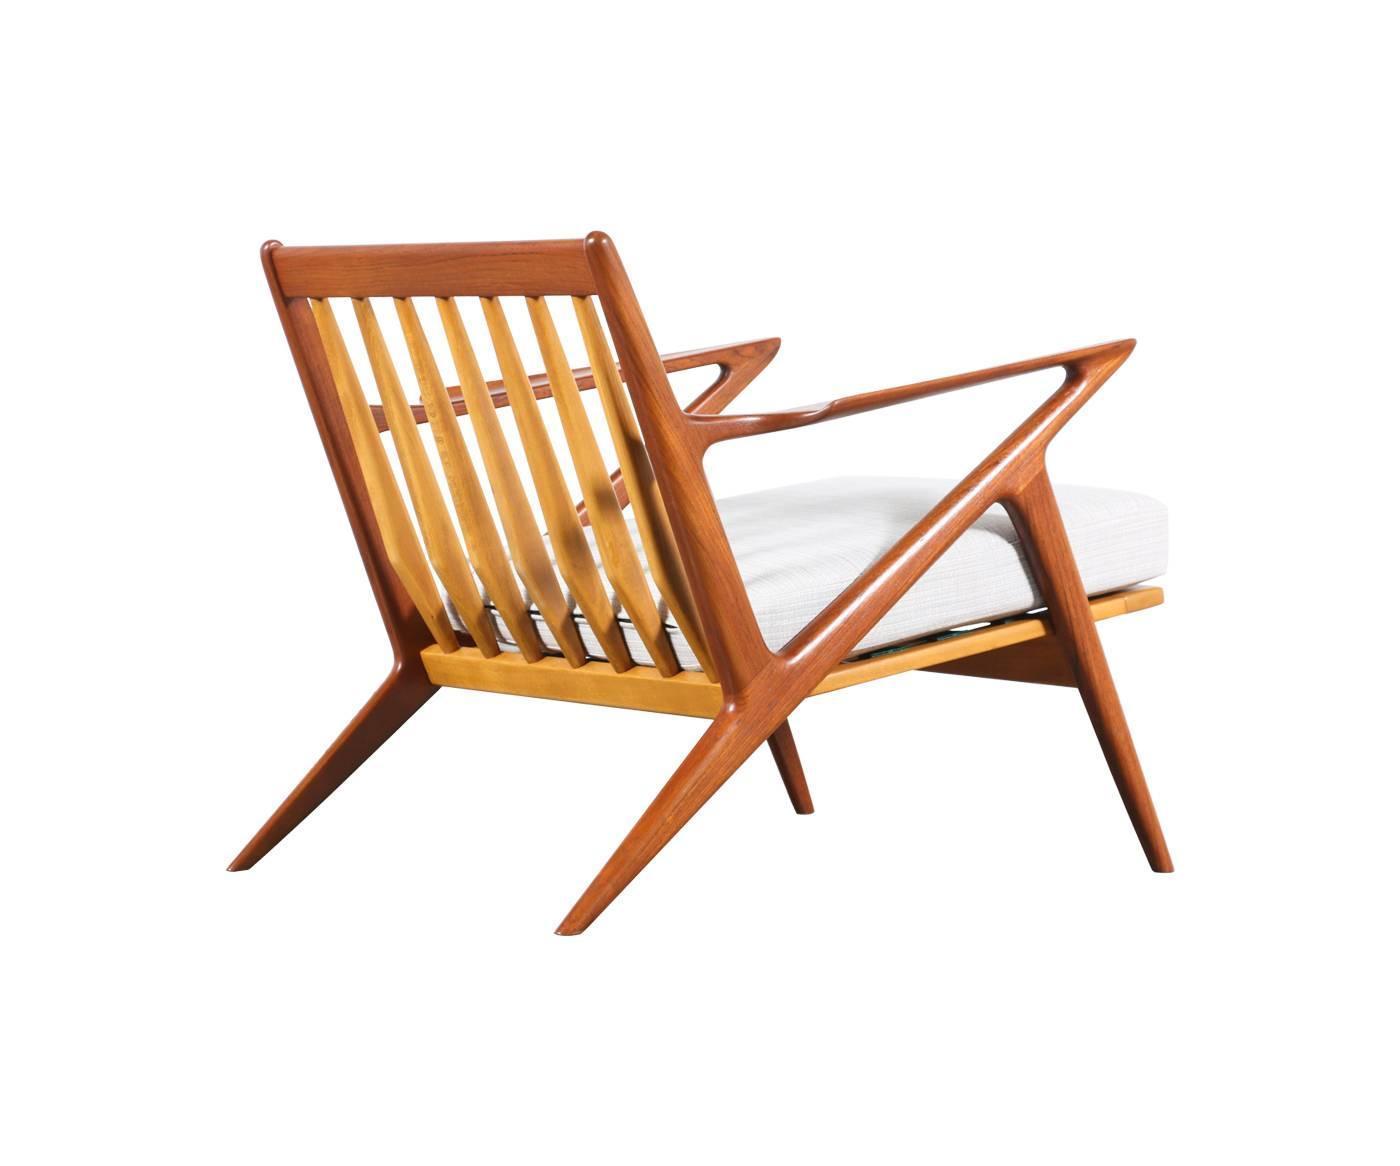 "Poul Jensen ""Z"" Teak Lounge Chair for Selig at 1stdibs"